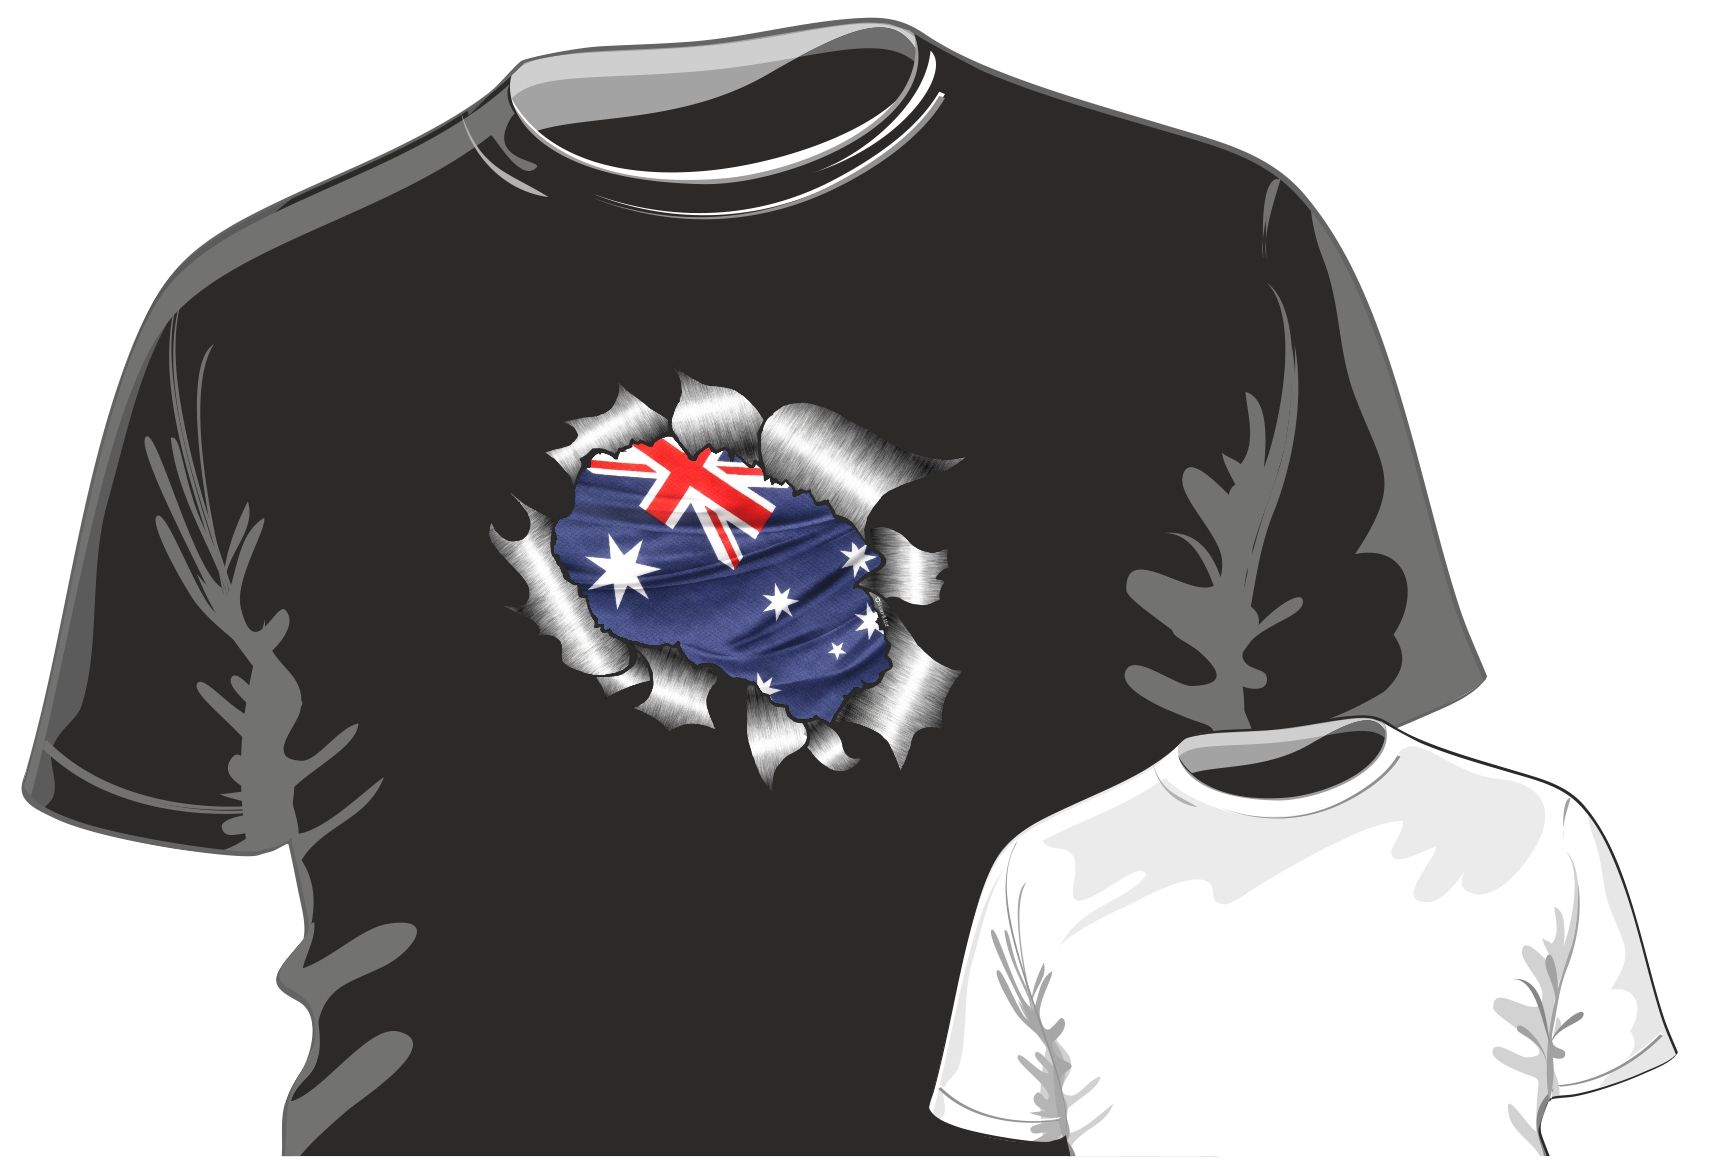 Shirt design australia - Ripped Torn Metal Design With Australia Australian Flag Motif Mens Or Ladyfit T Shirt